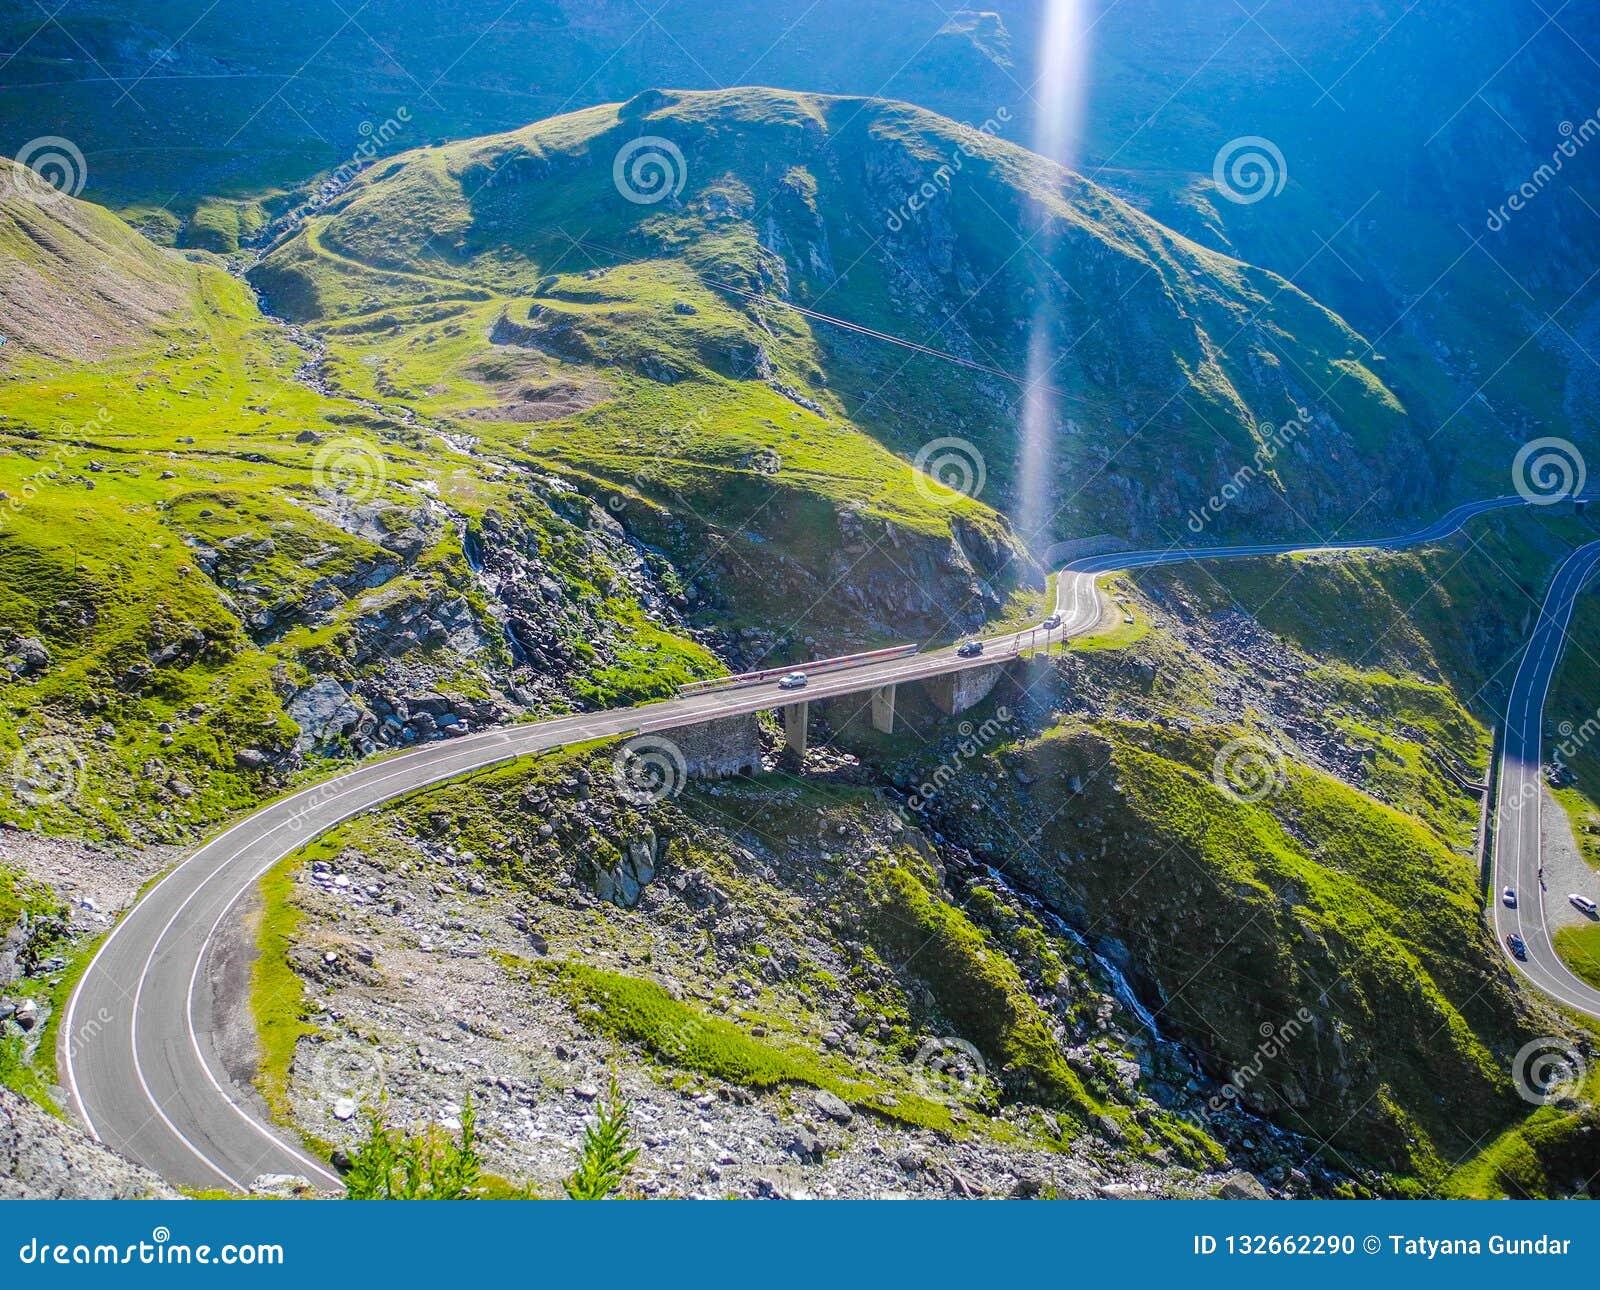 The Transfagarasan mountain road